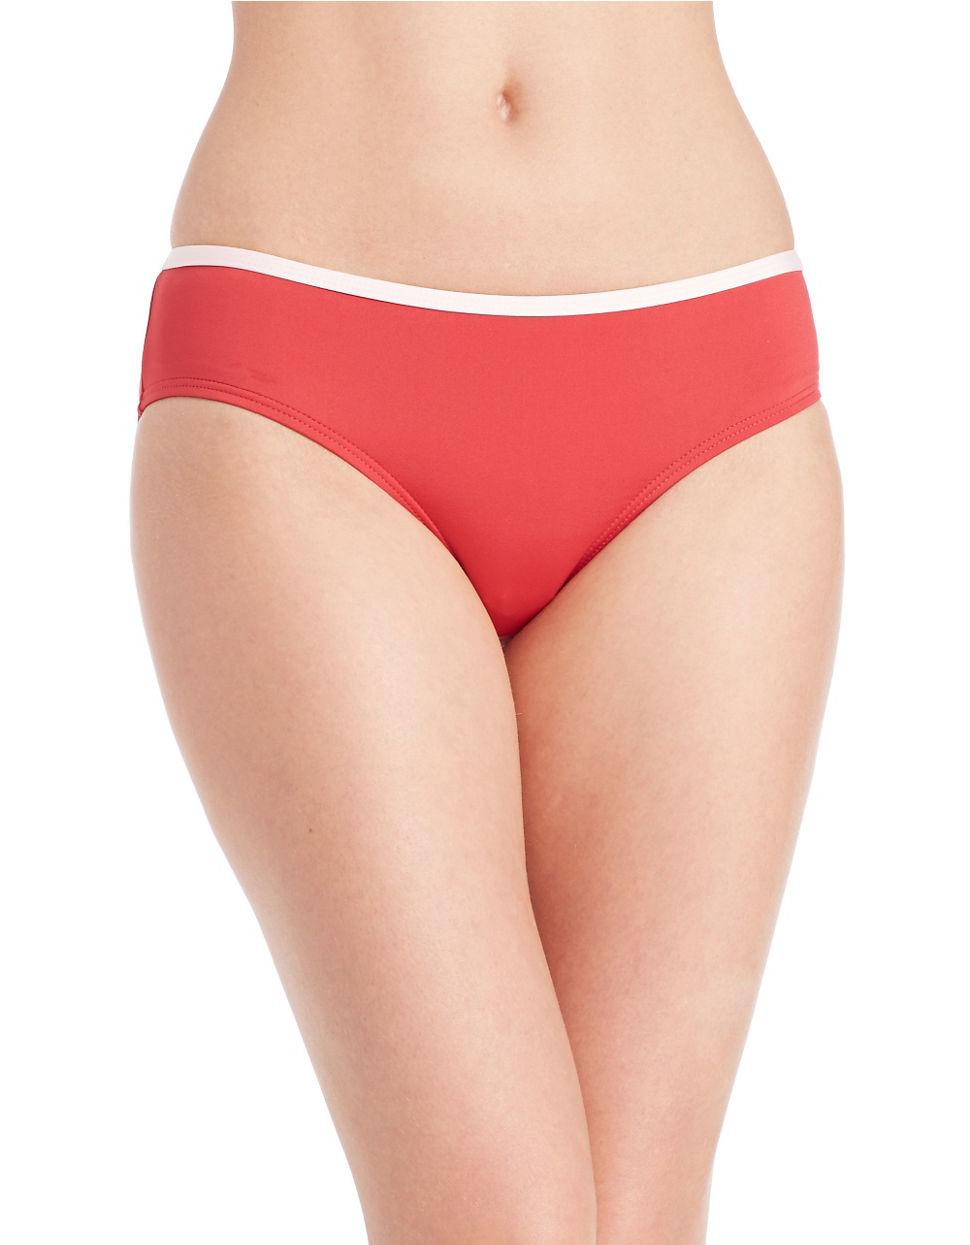 776c9103d4 Lyst - Kate Spade New York Plage Du Midi Hipster Bikini Bottom in Red